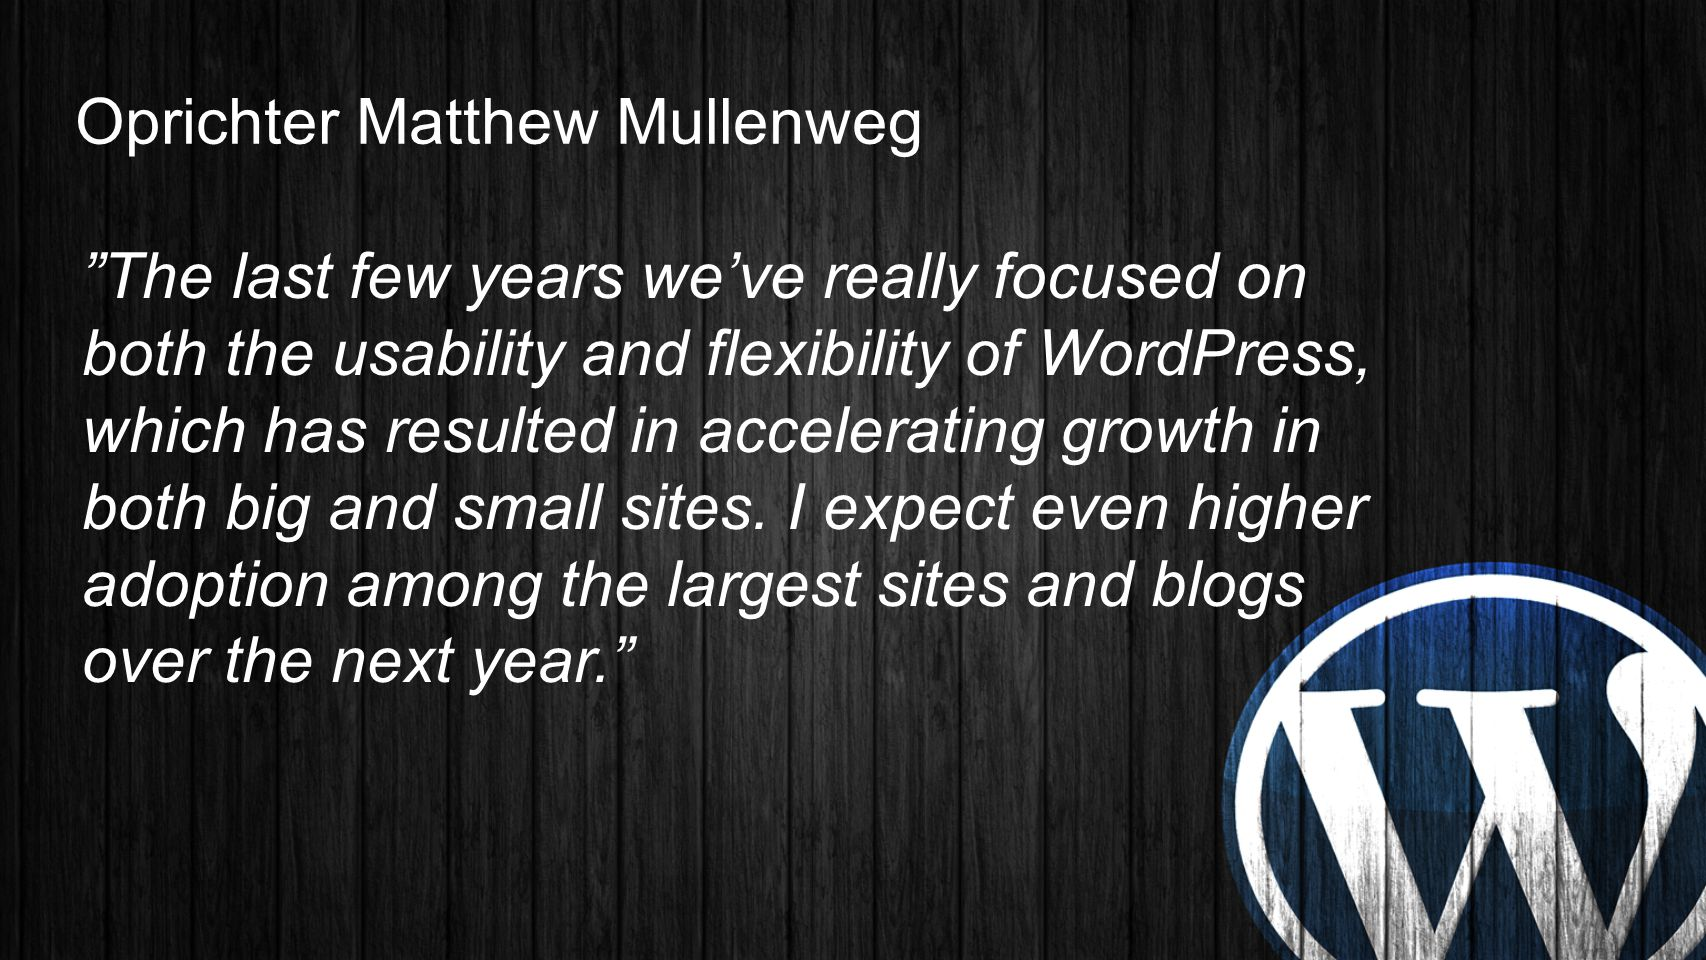 Oprichter Matthew Mullenweg